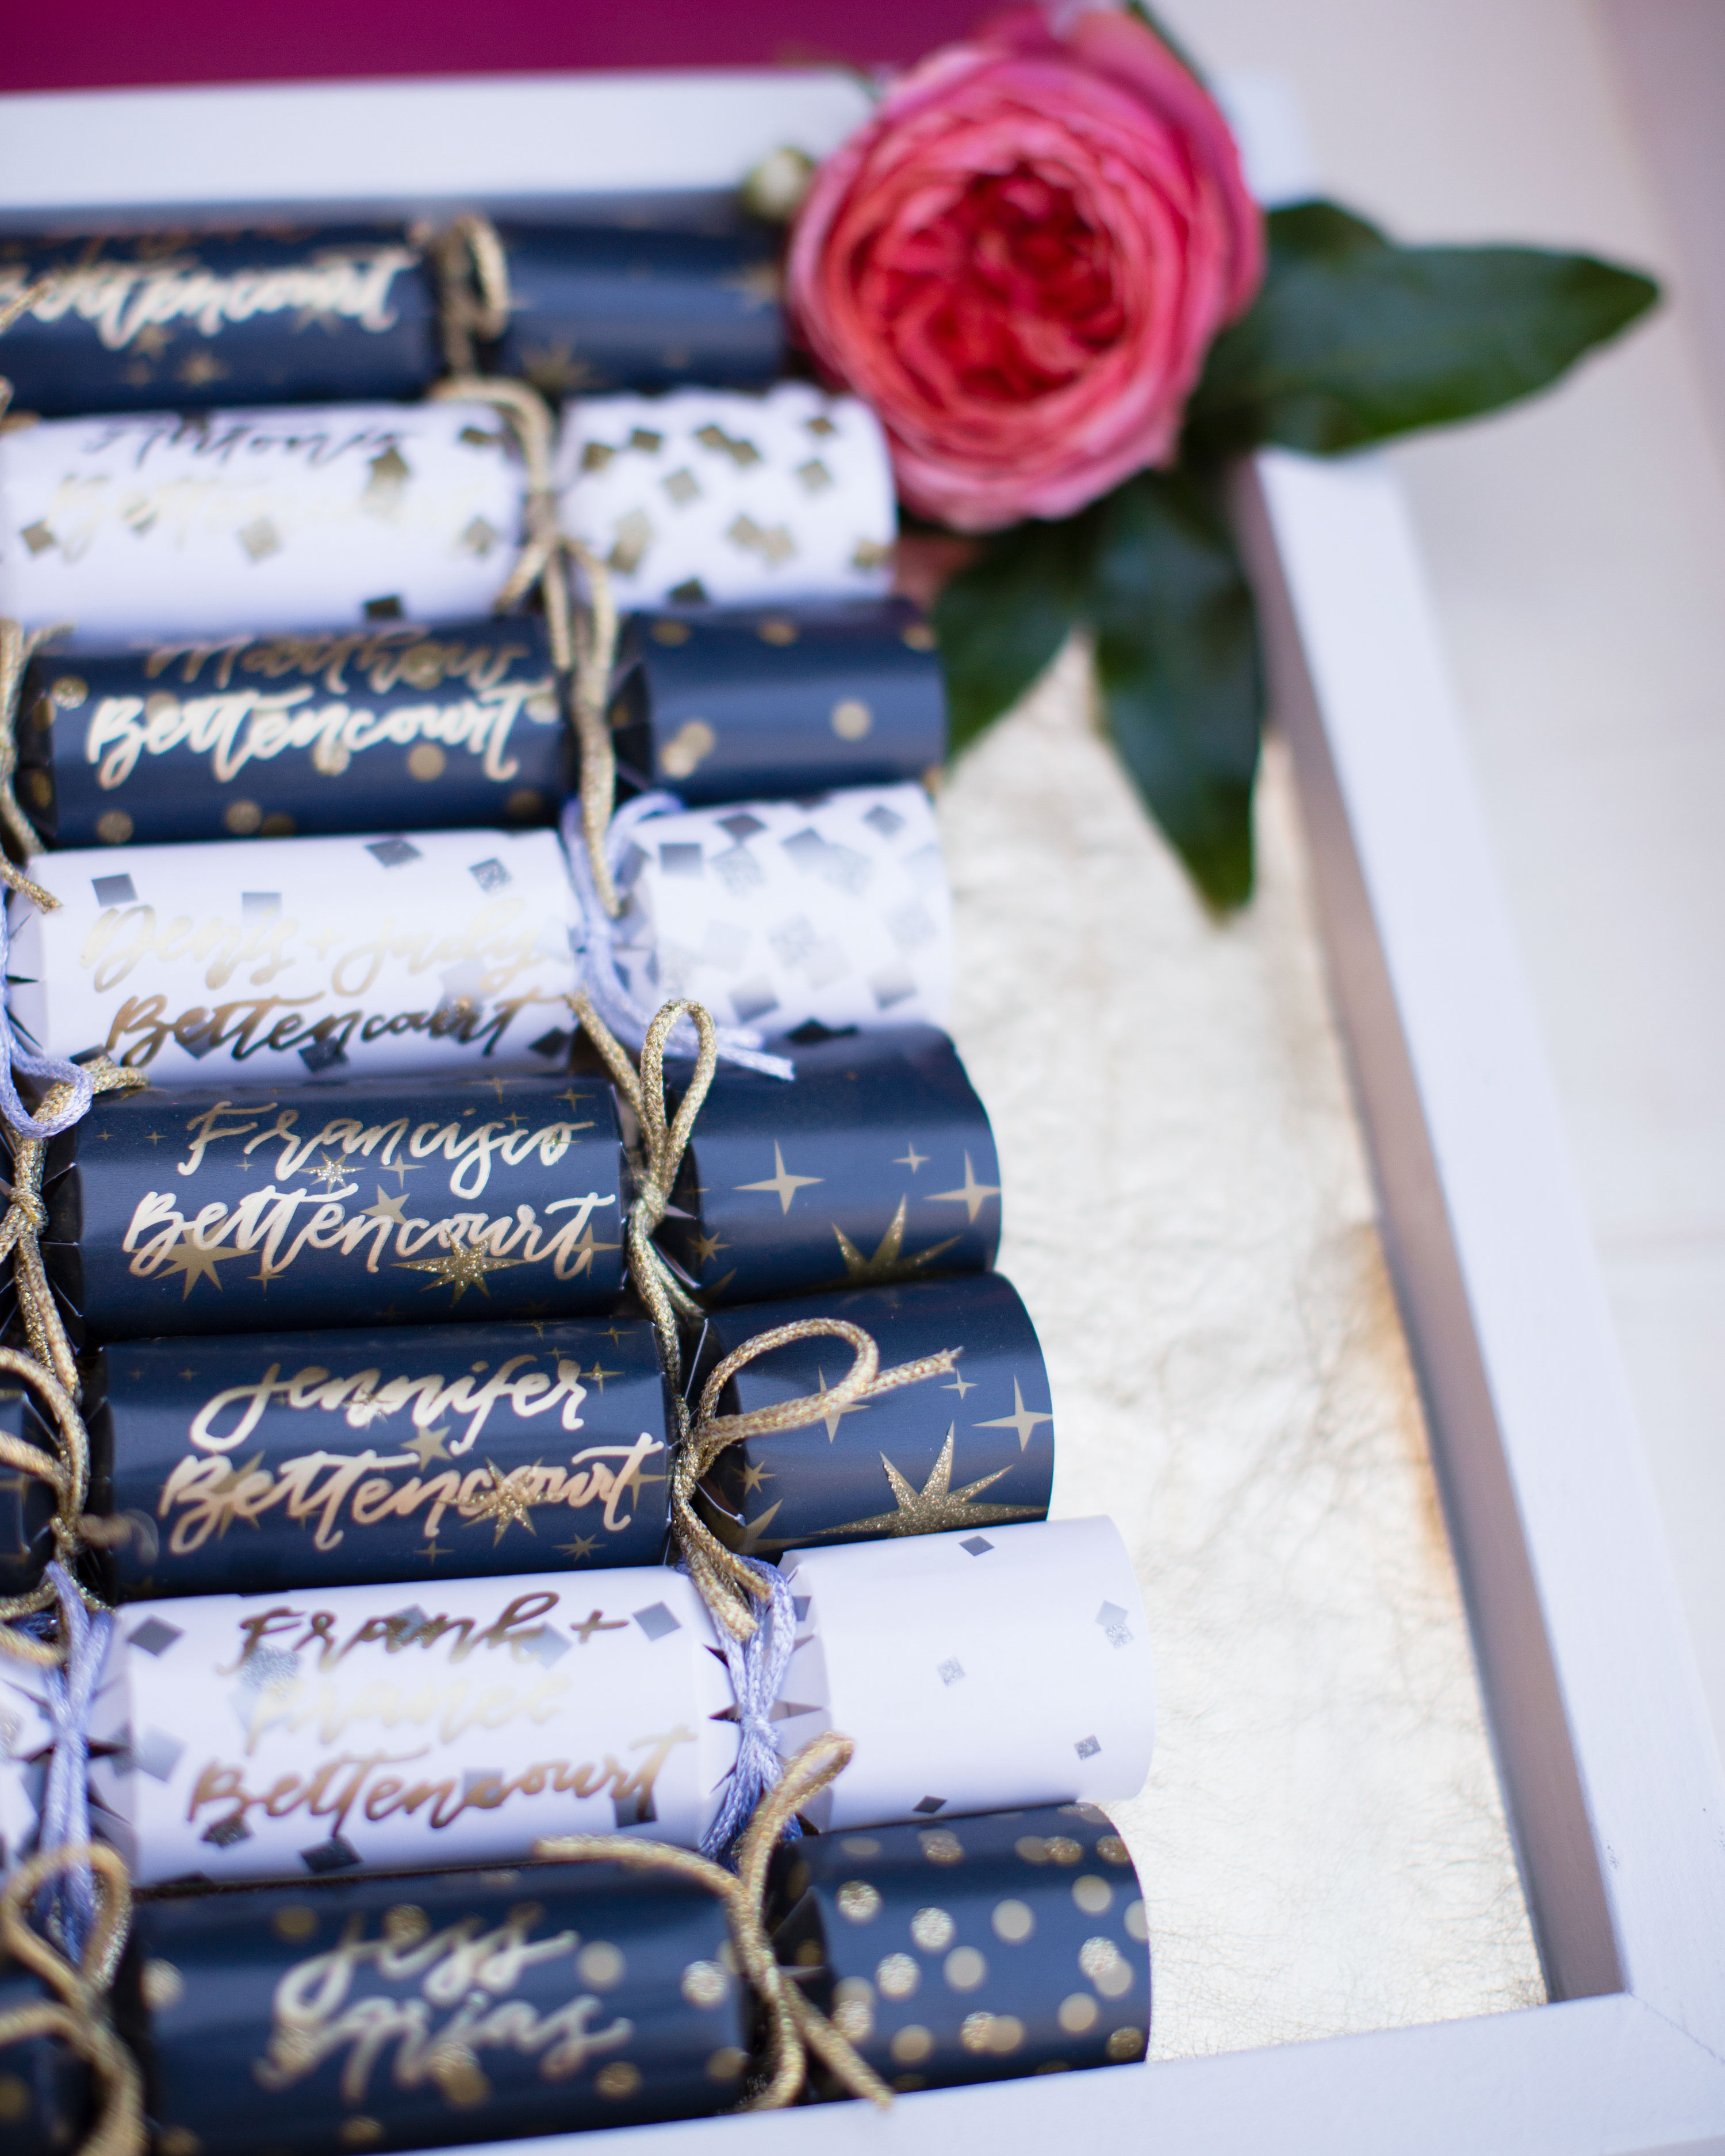 richelle-tom-wedding-crackers-escortcards-422-s112855-0416.jpg